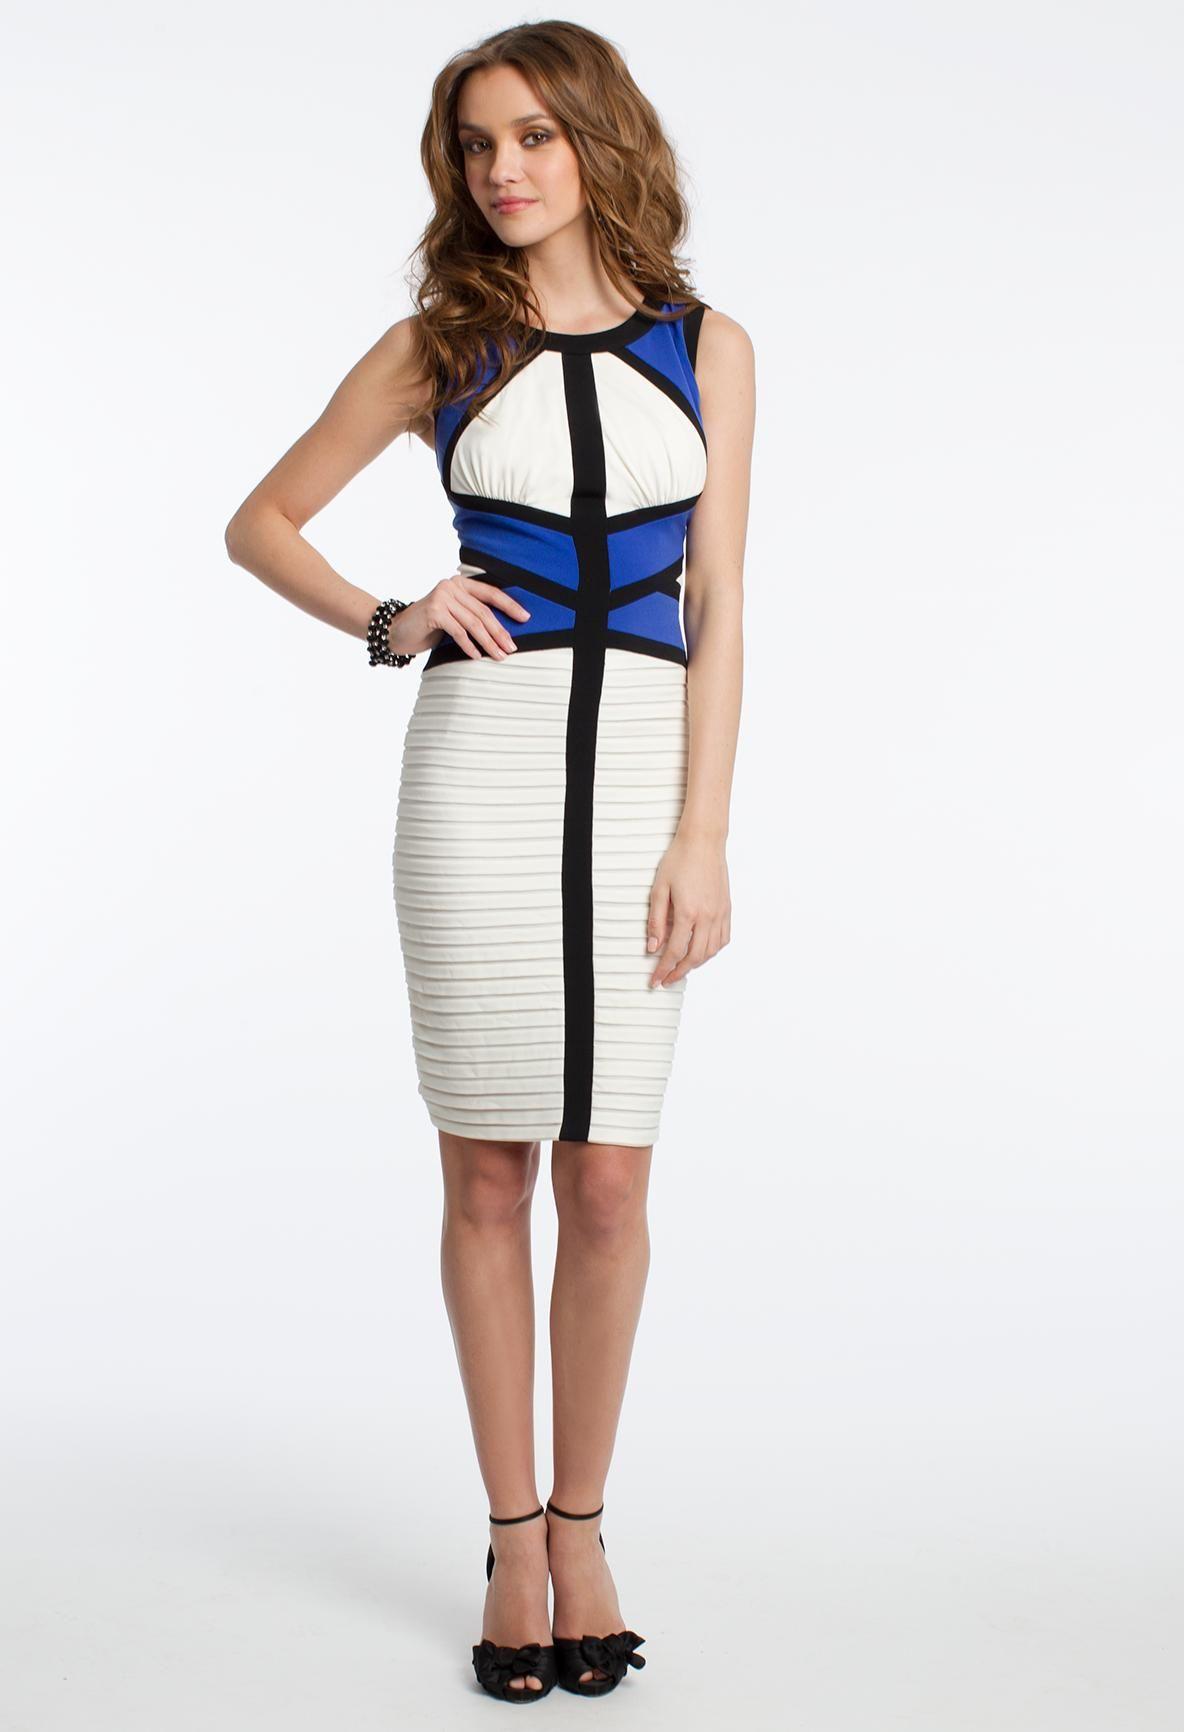 Colorblock jersey dress homecoming dresses shortdress style